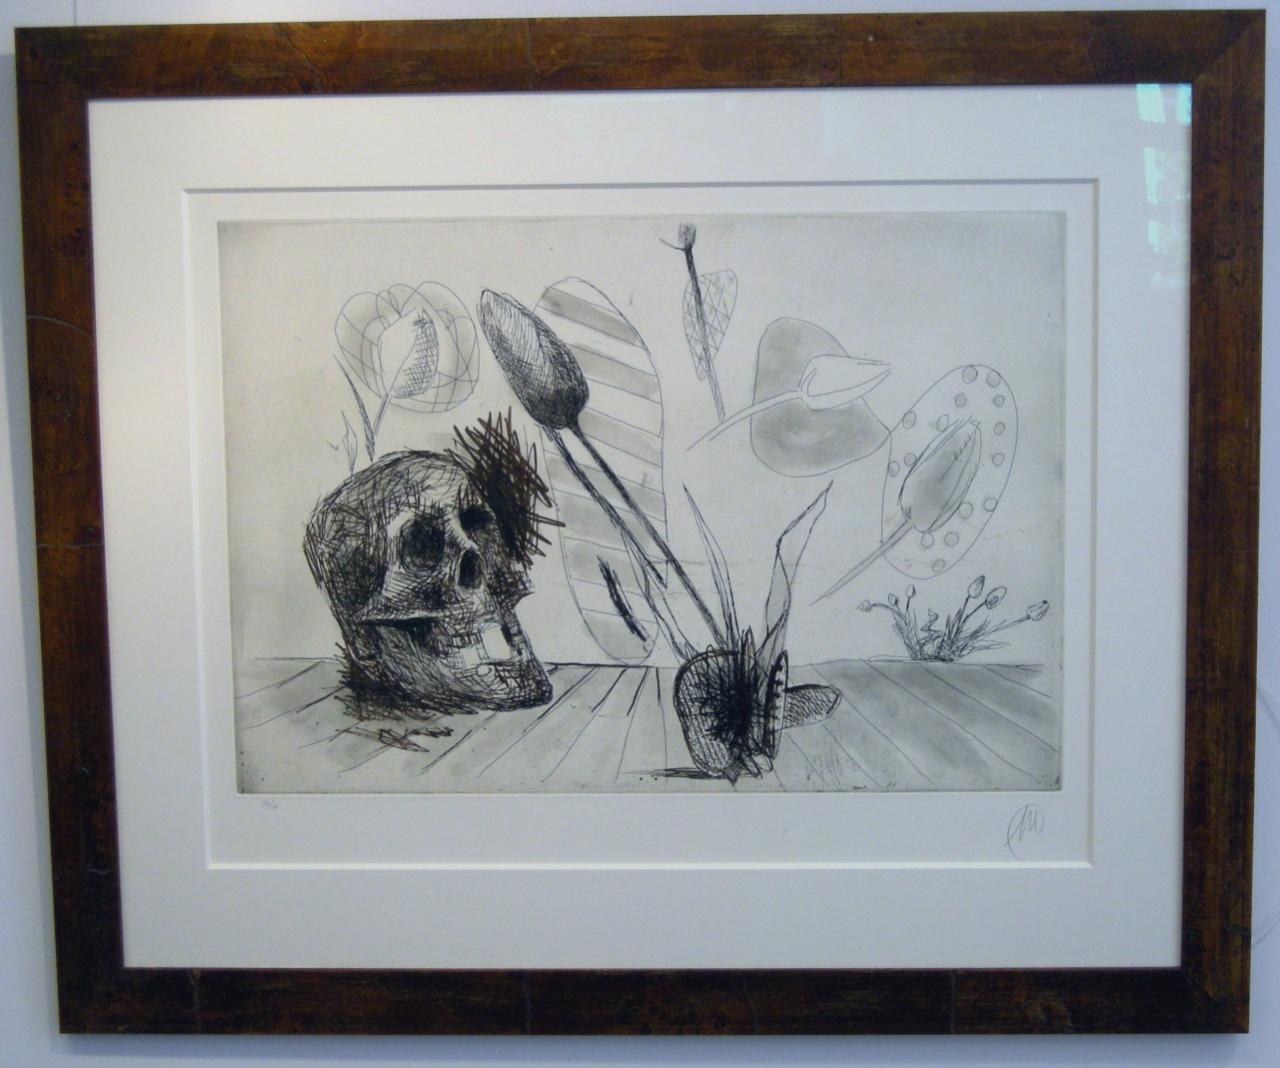 Spanische Serie Skull, gerahmt